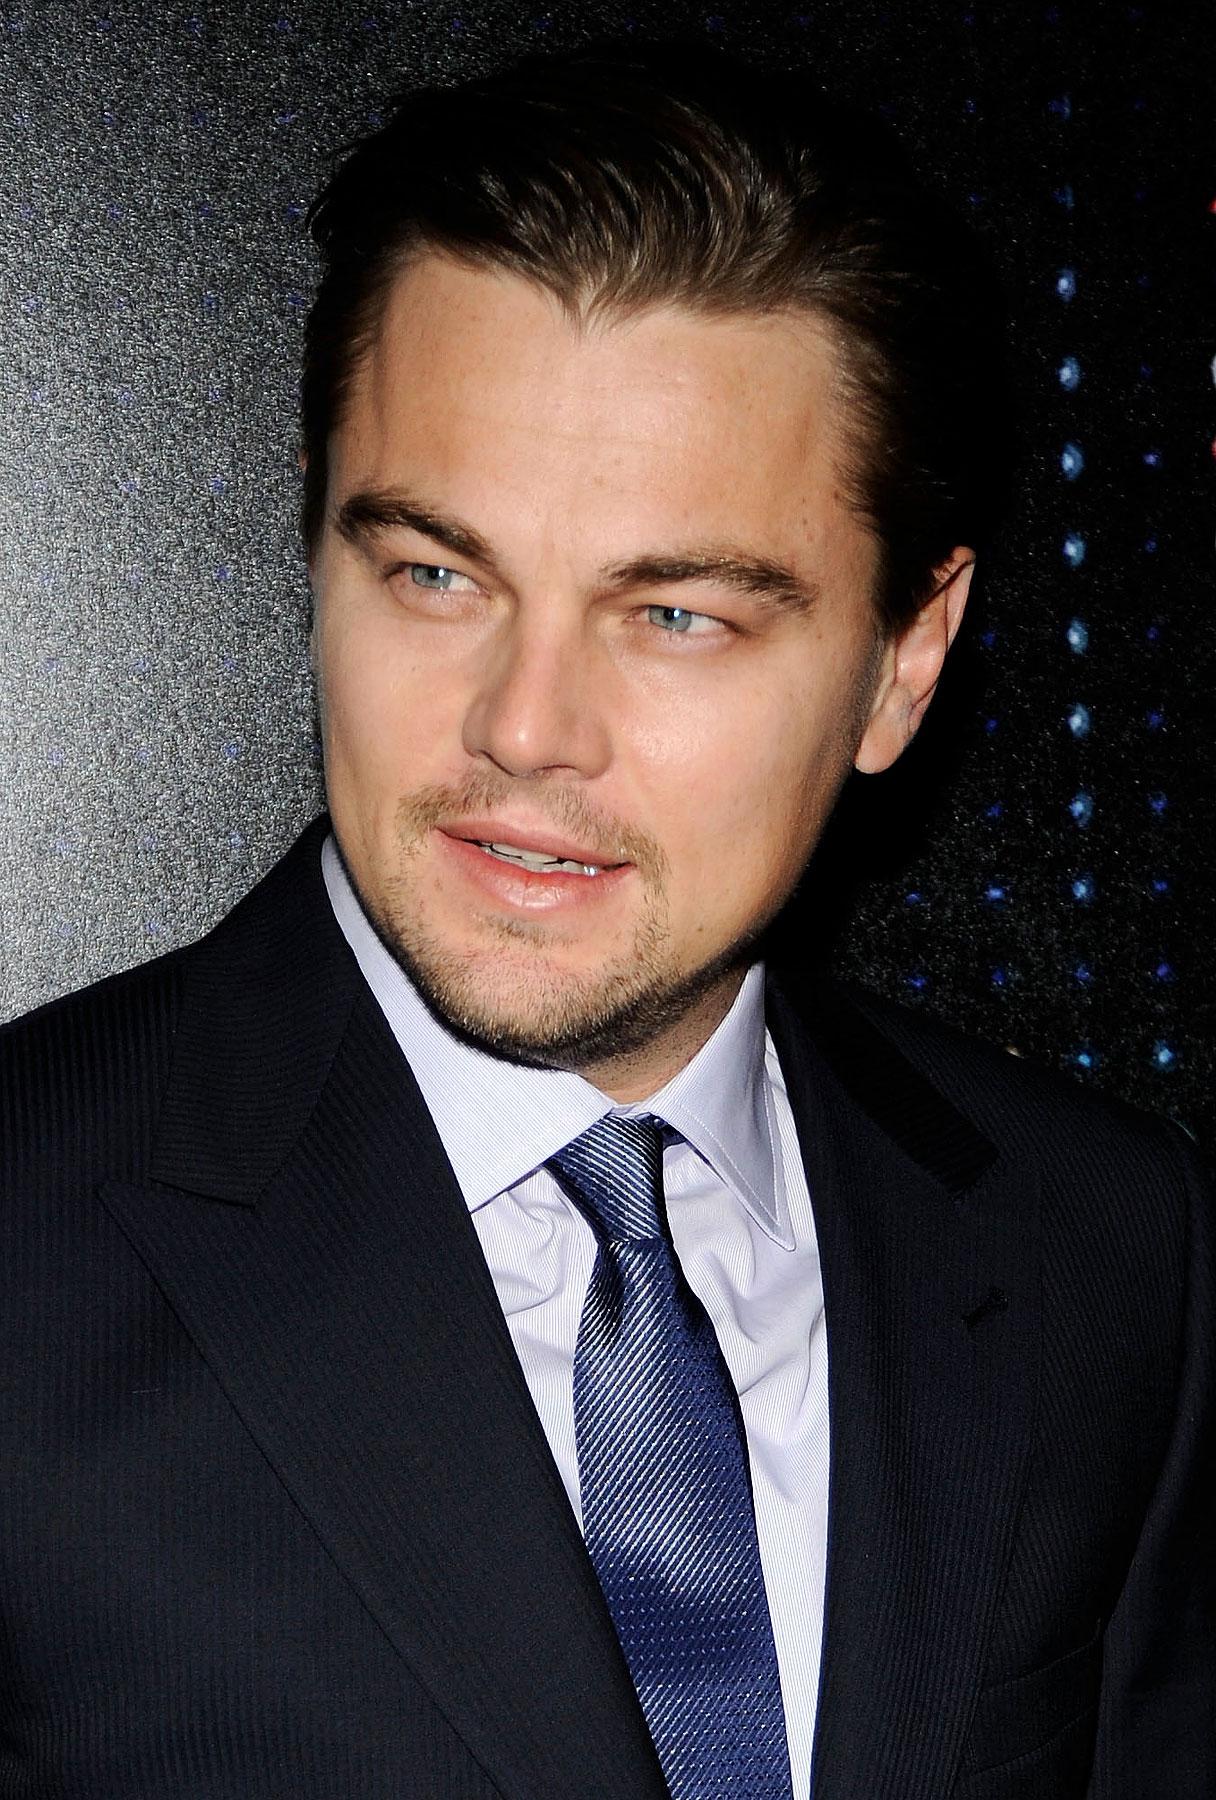 Leonardo DiCaprio Told To Drop 30 Pounds